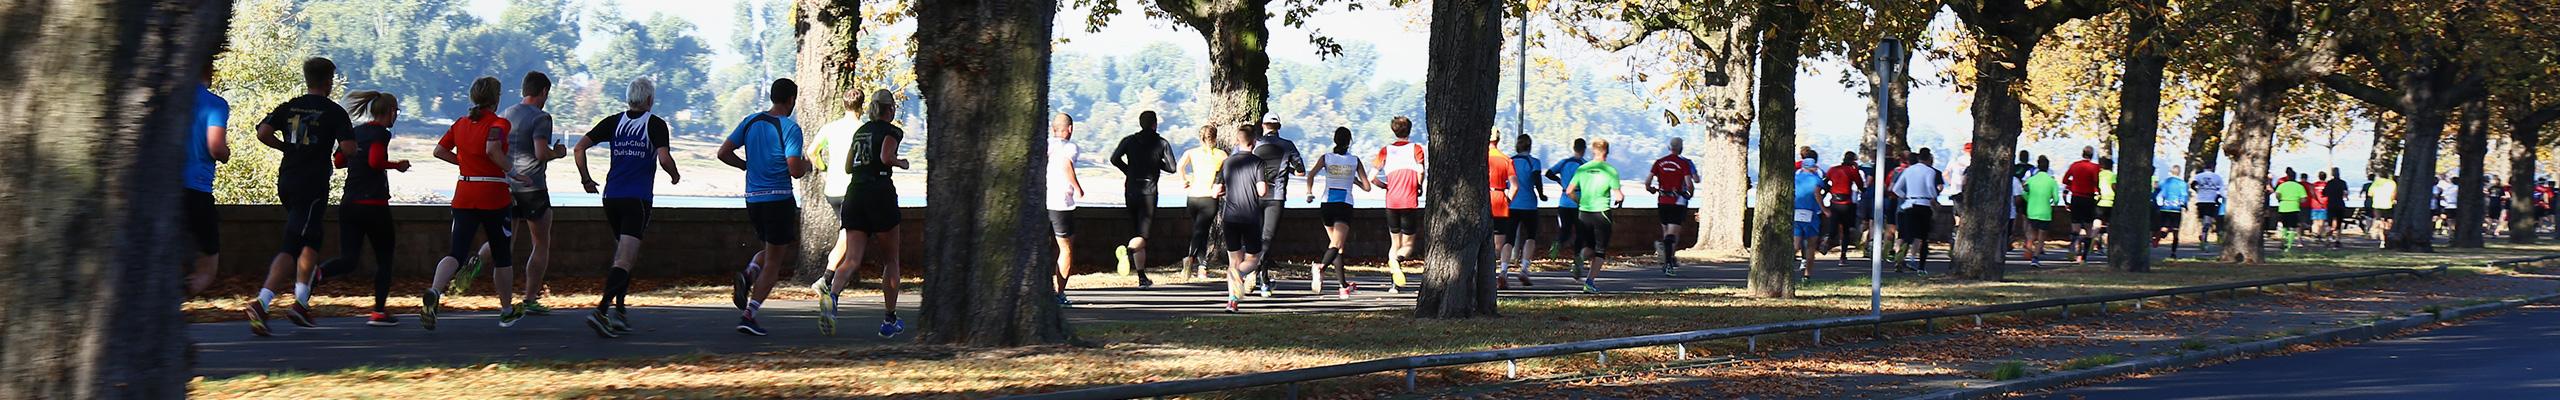 Rhein City Run 25.10.2020